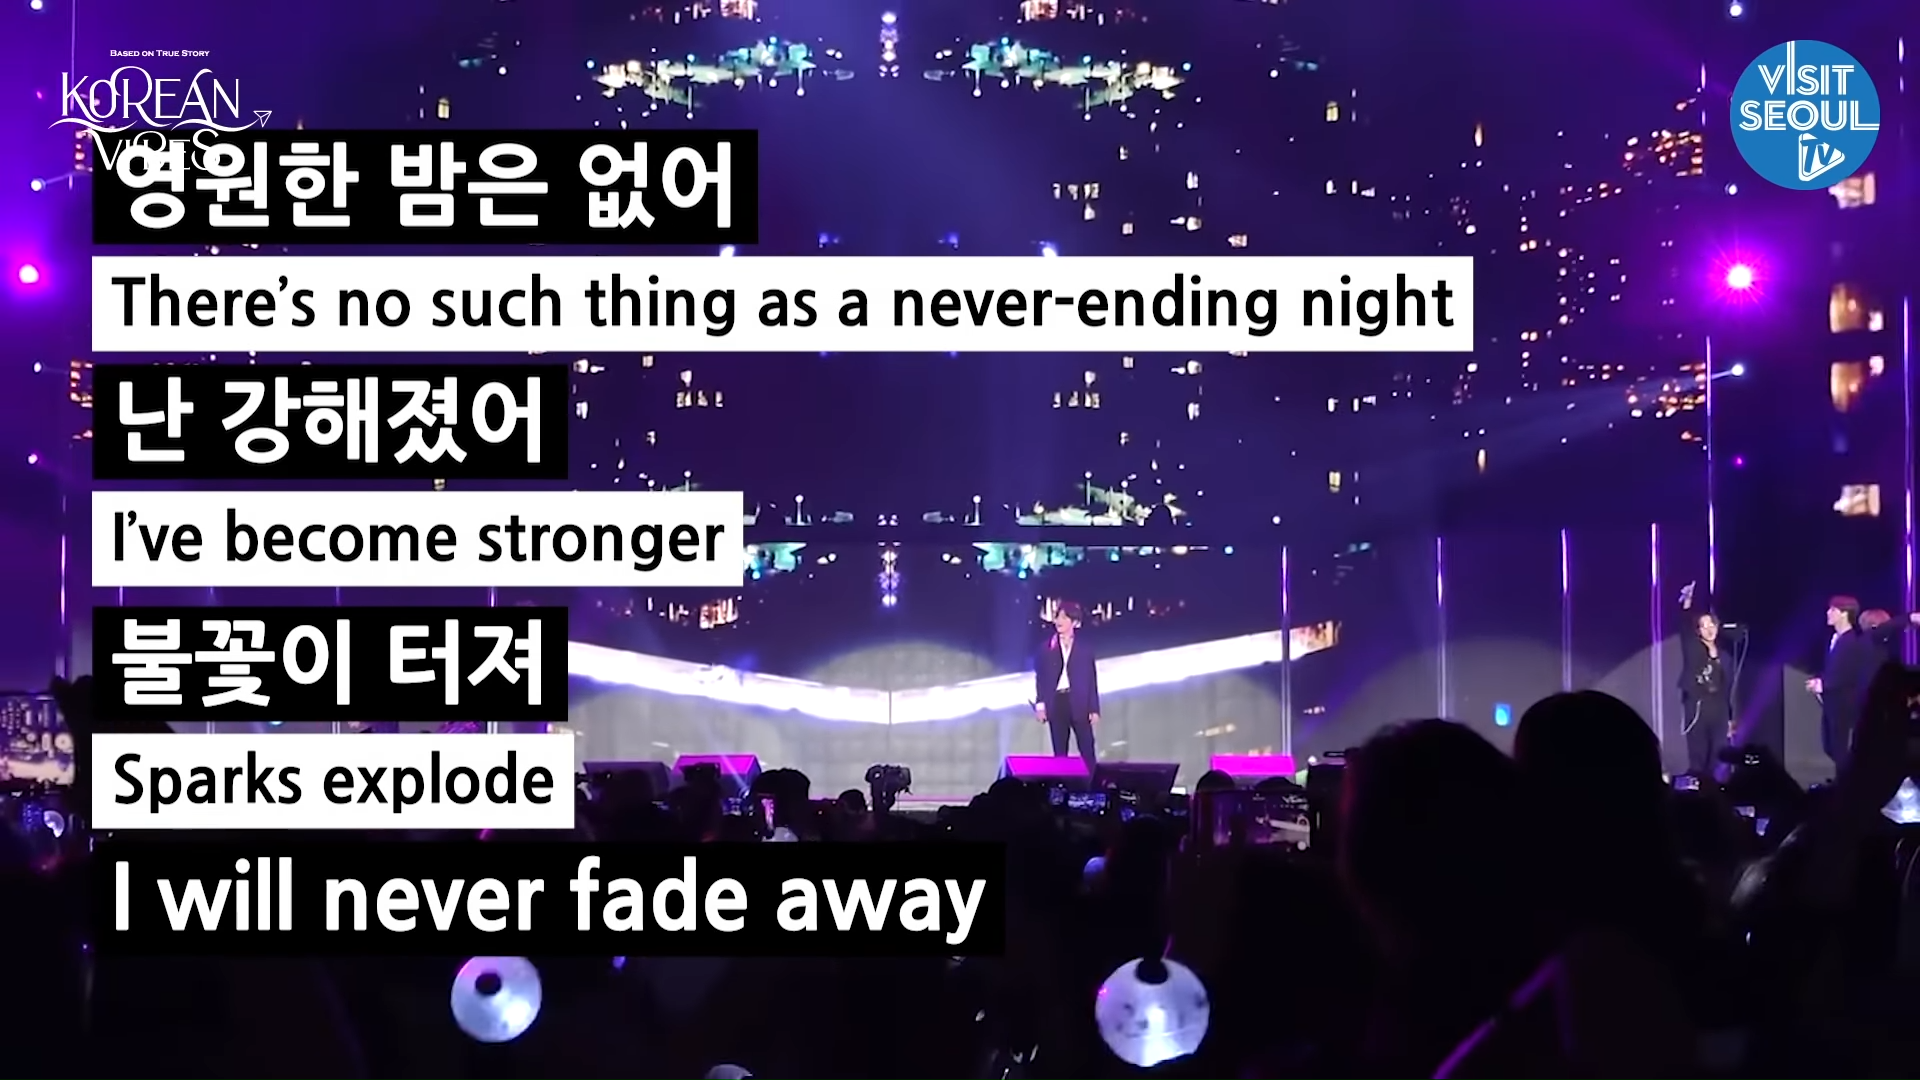 BTS - Dis-ease Explained by a Korean 10-22 screenshot